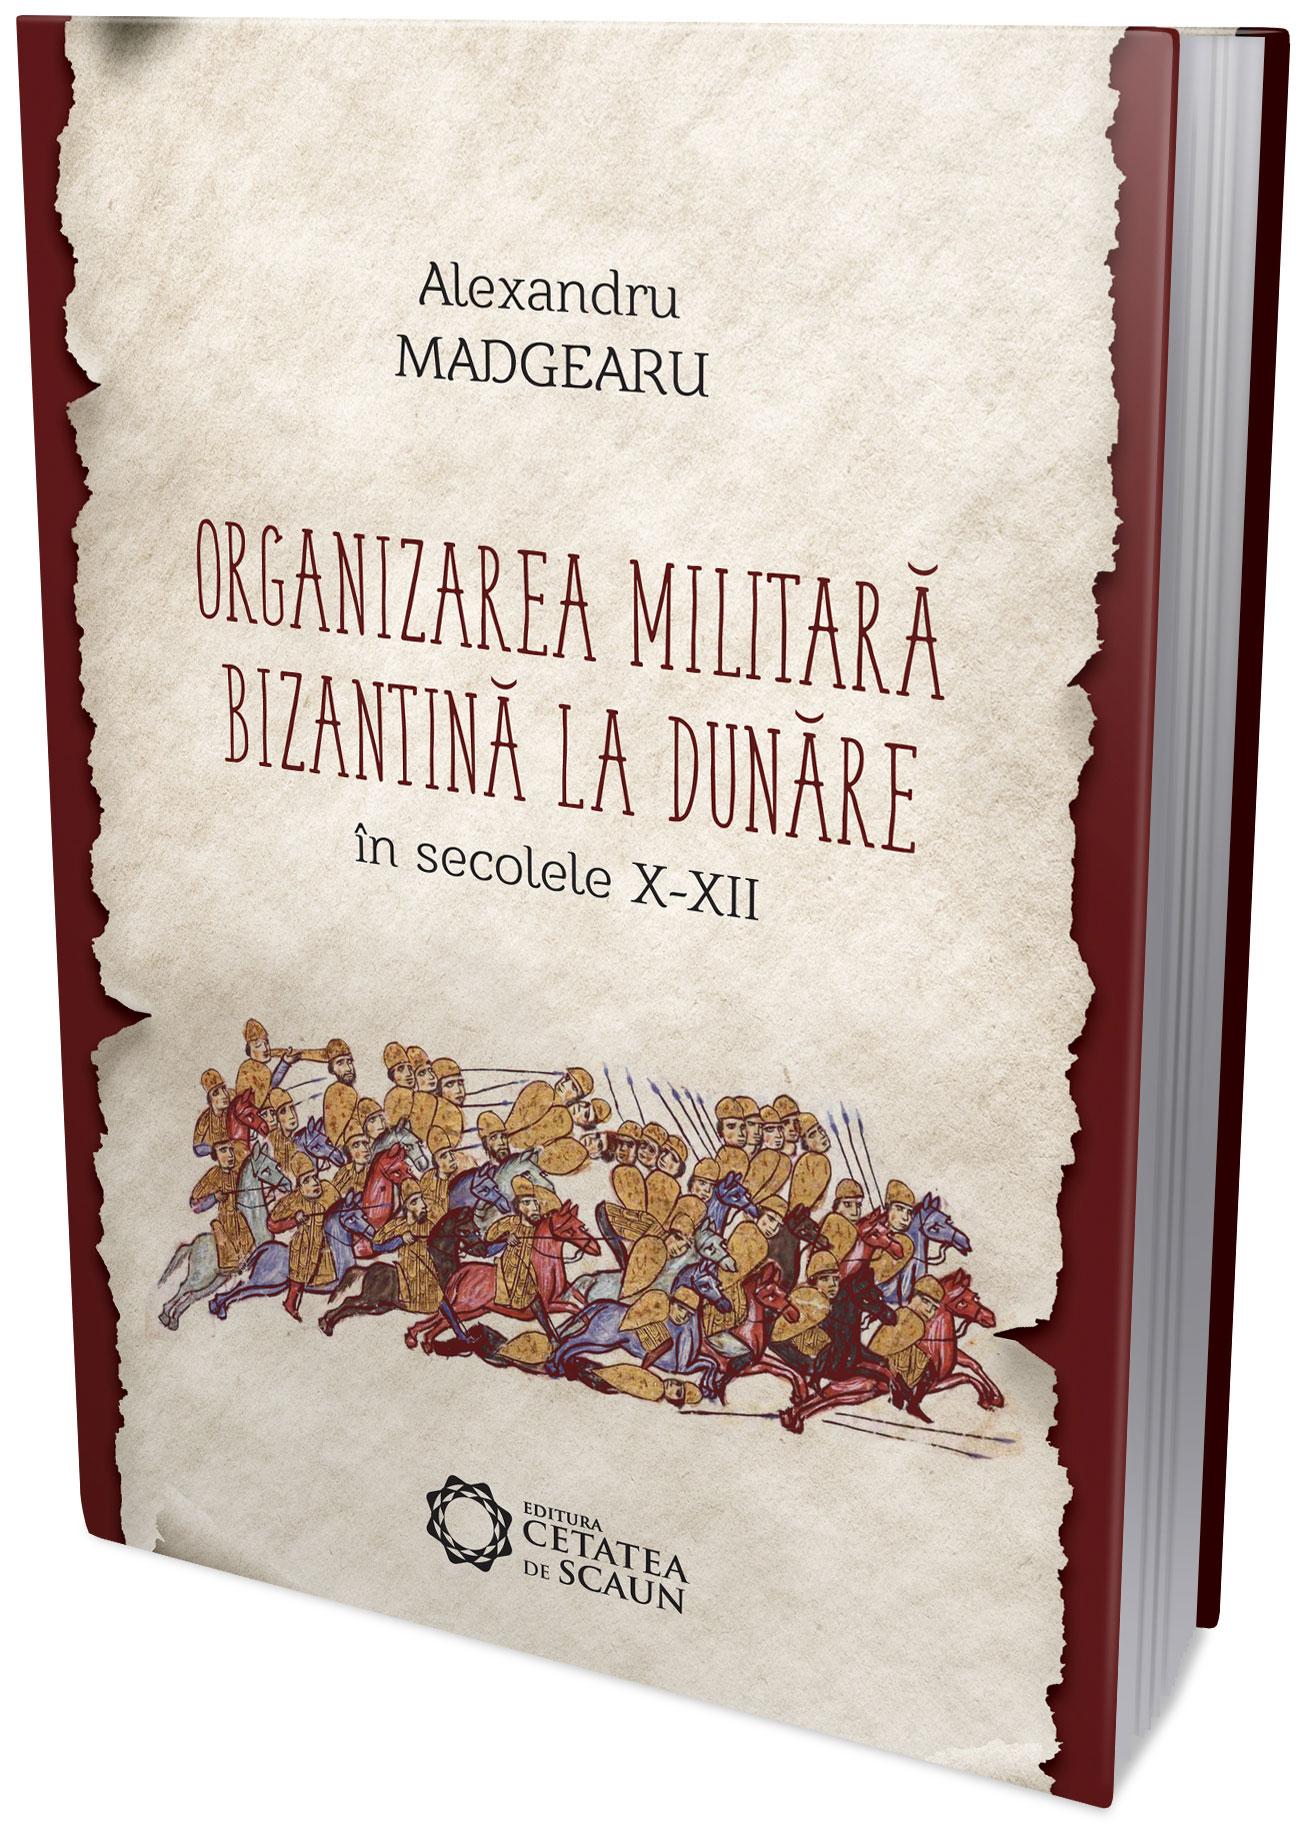 Organizarea militara bizantina la Dunare in sec. X-XII